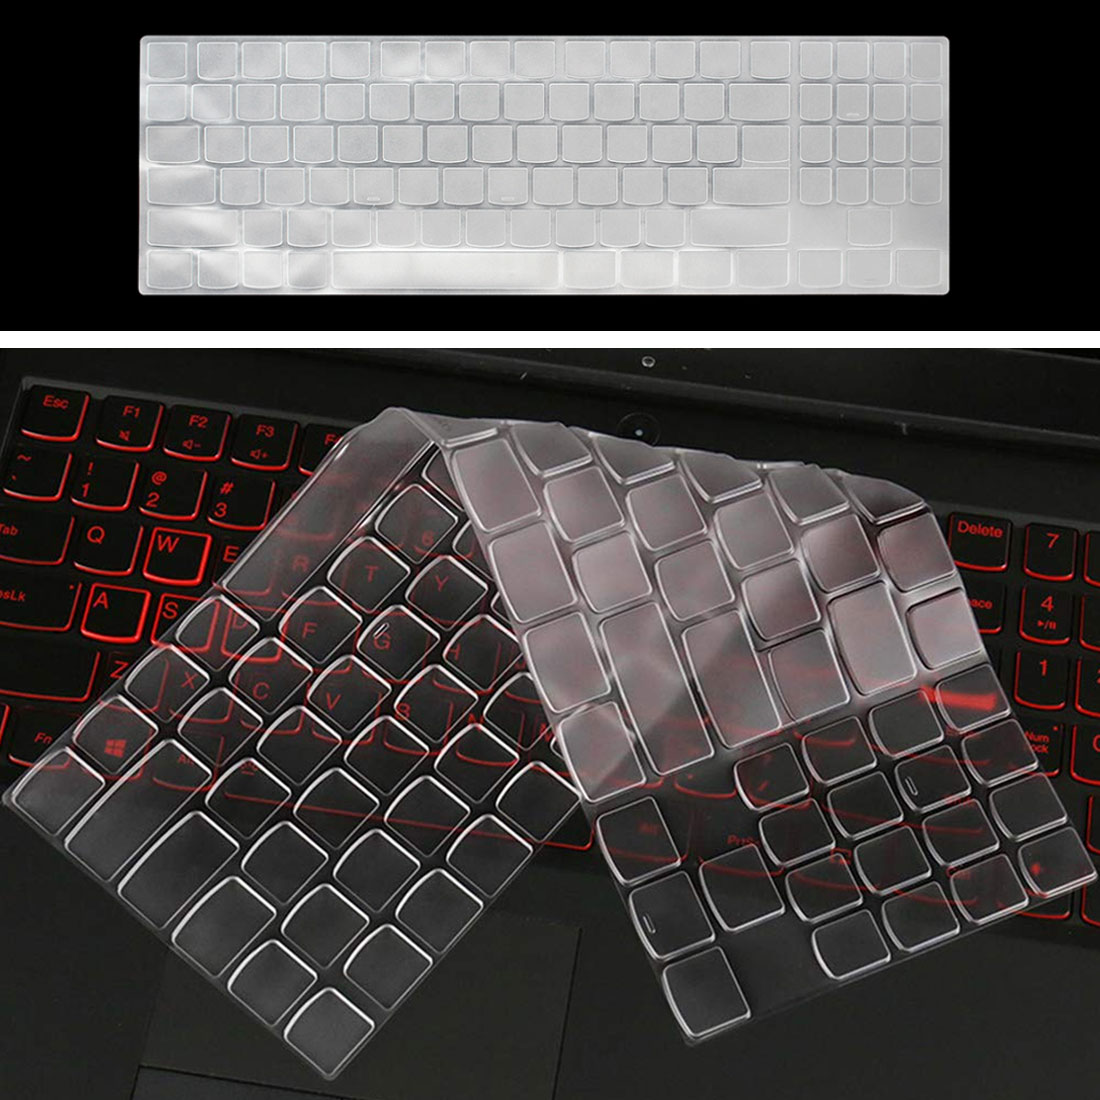 Rainbow 2020 15 Inch Silicone Keyboard Cover Protective Skin for 15.6 Inch Lenovo Legion Y740 Y730 Y720 Y520 Y530 R720 R730 R720 15Ikbn